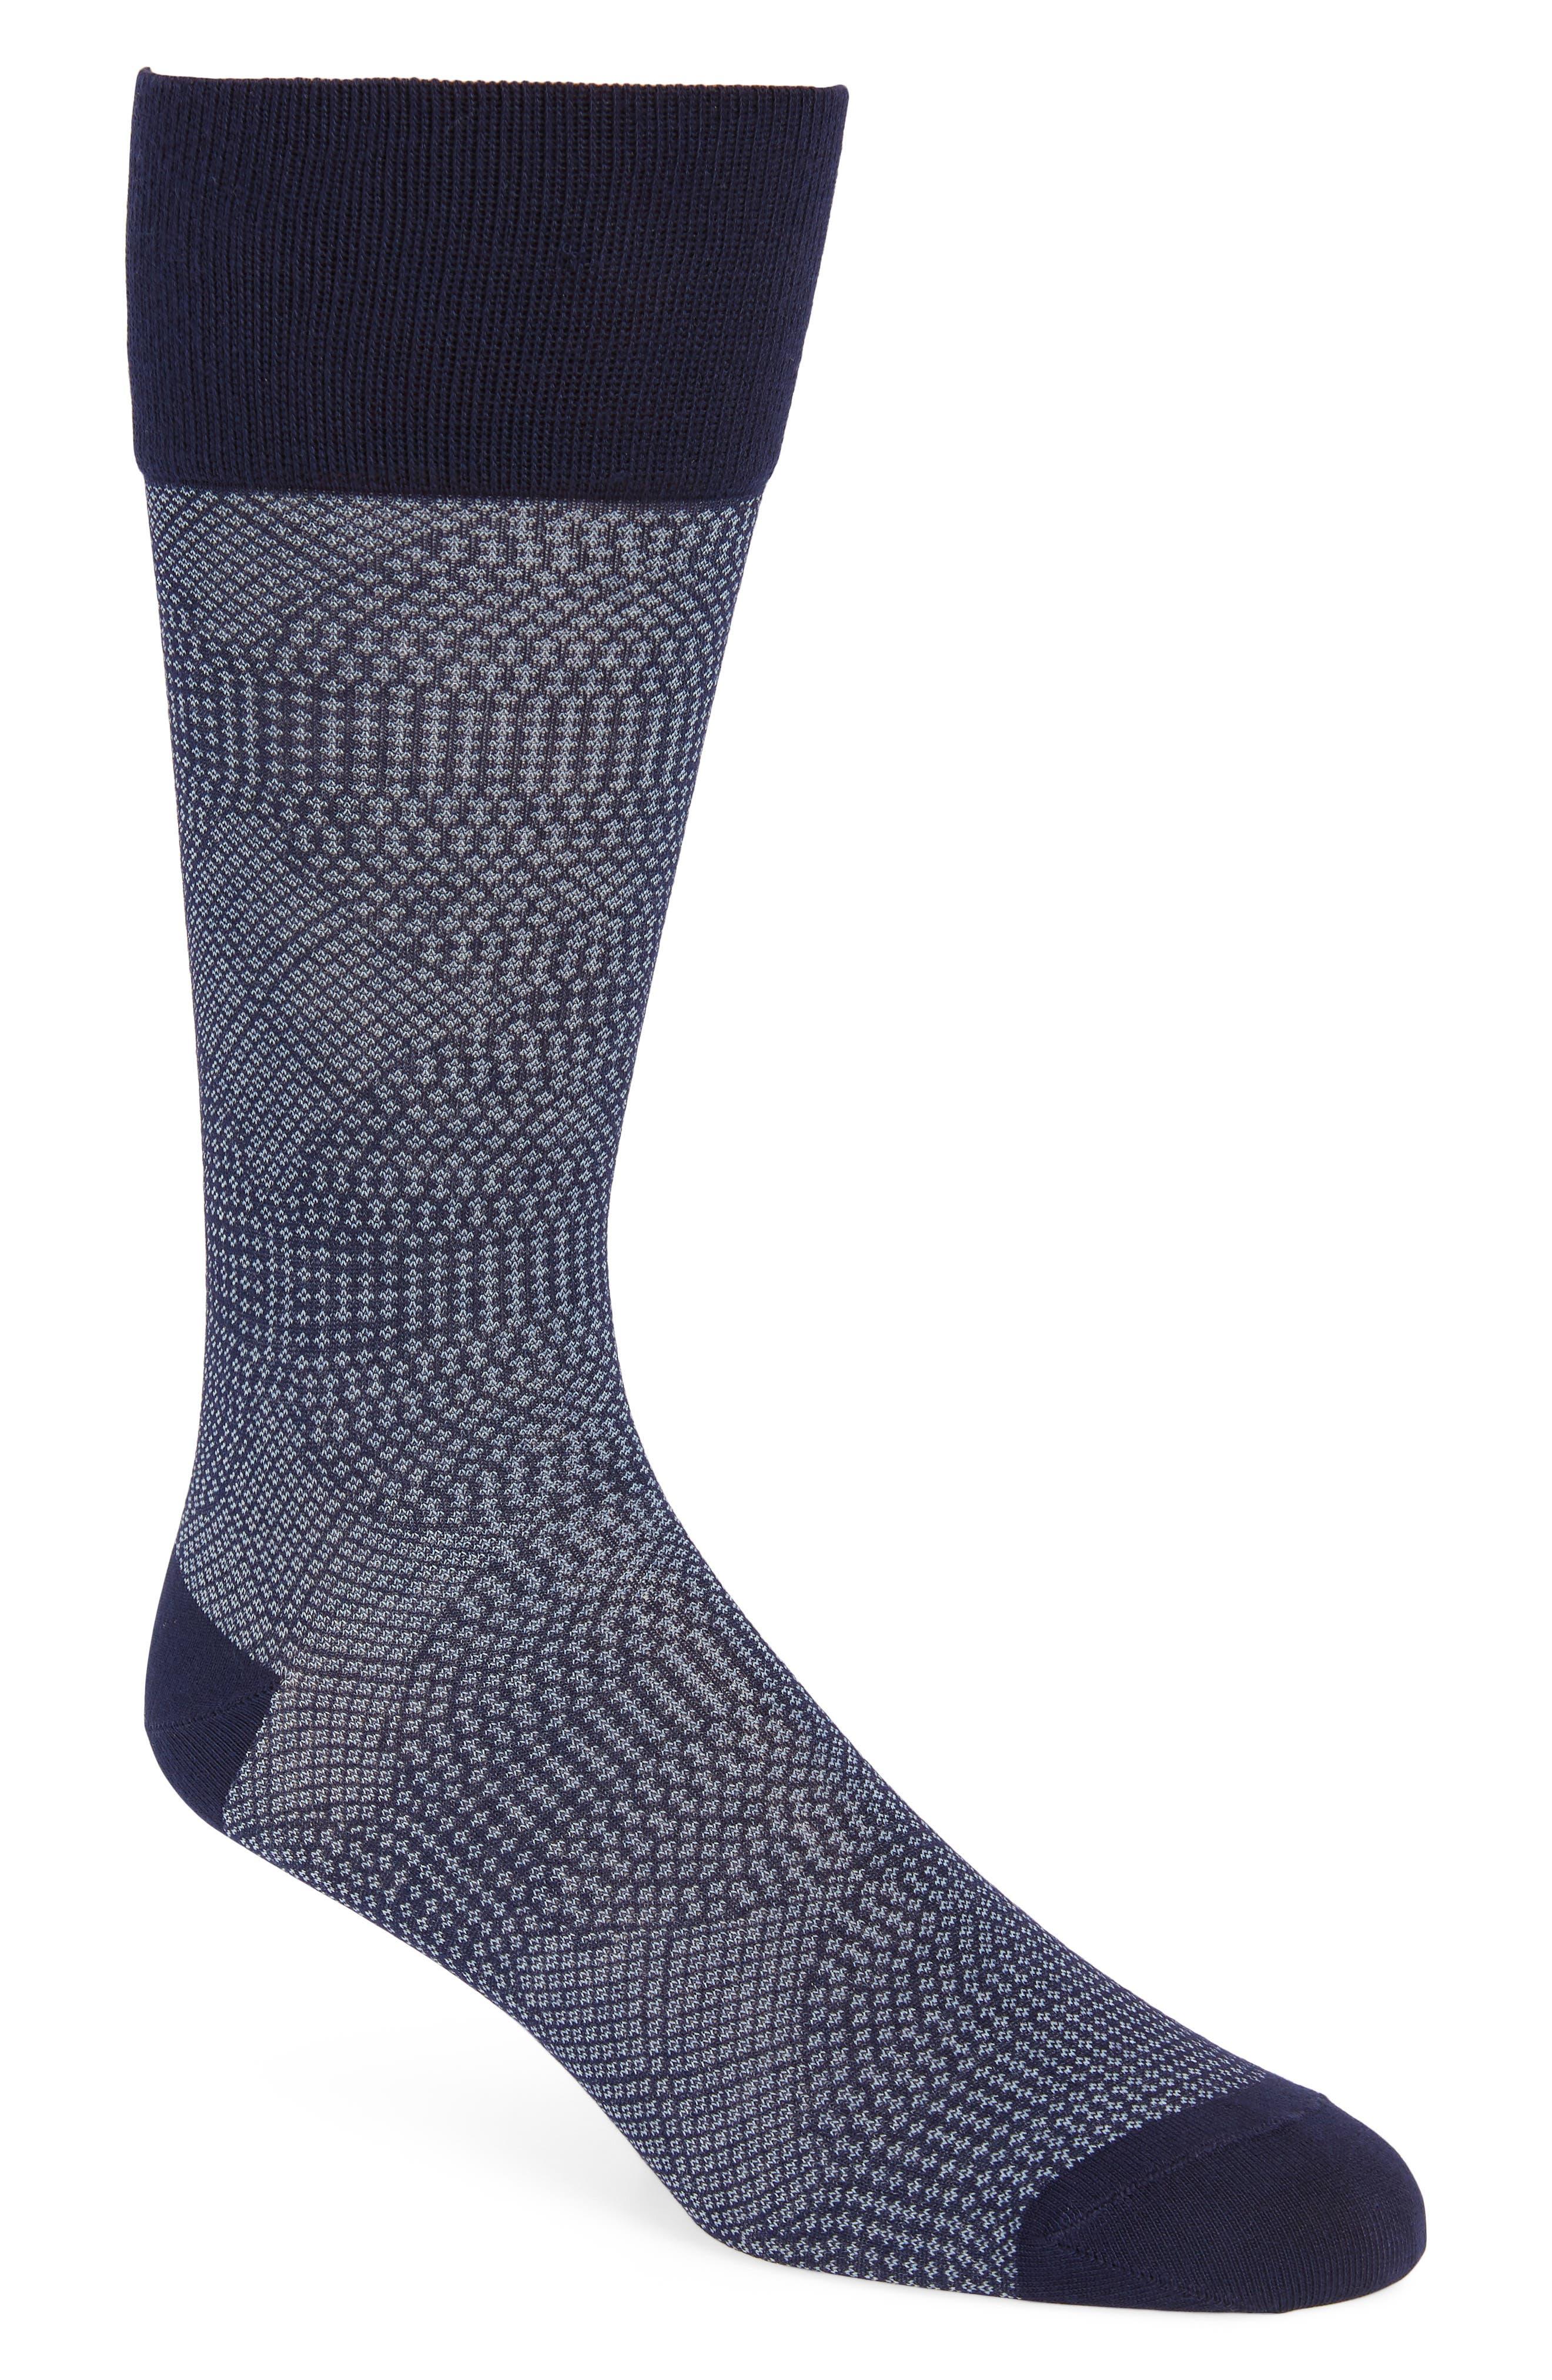 Quatrefoil Solid Socks,                             Main thumbnail 1, color,                             Navy/ White